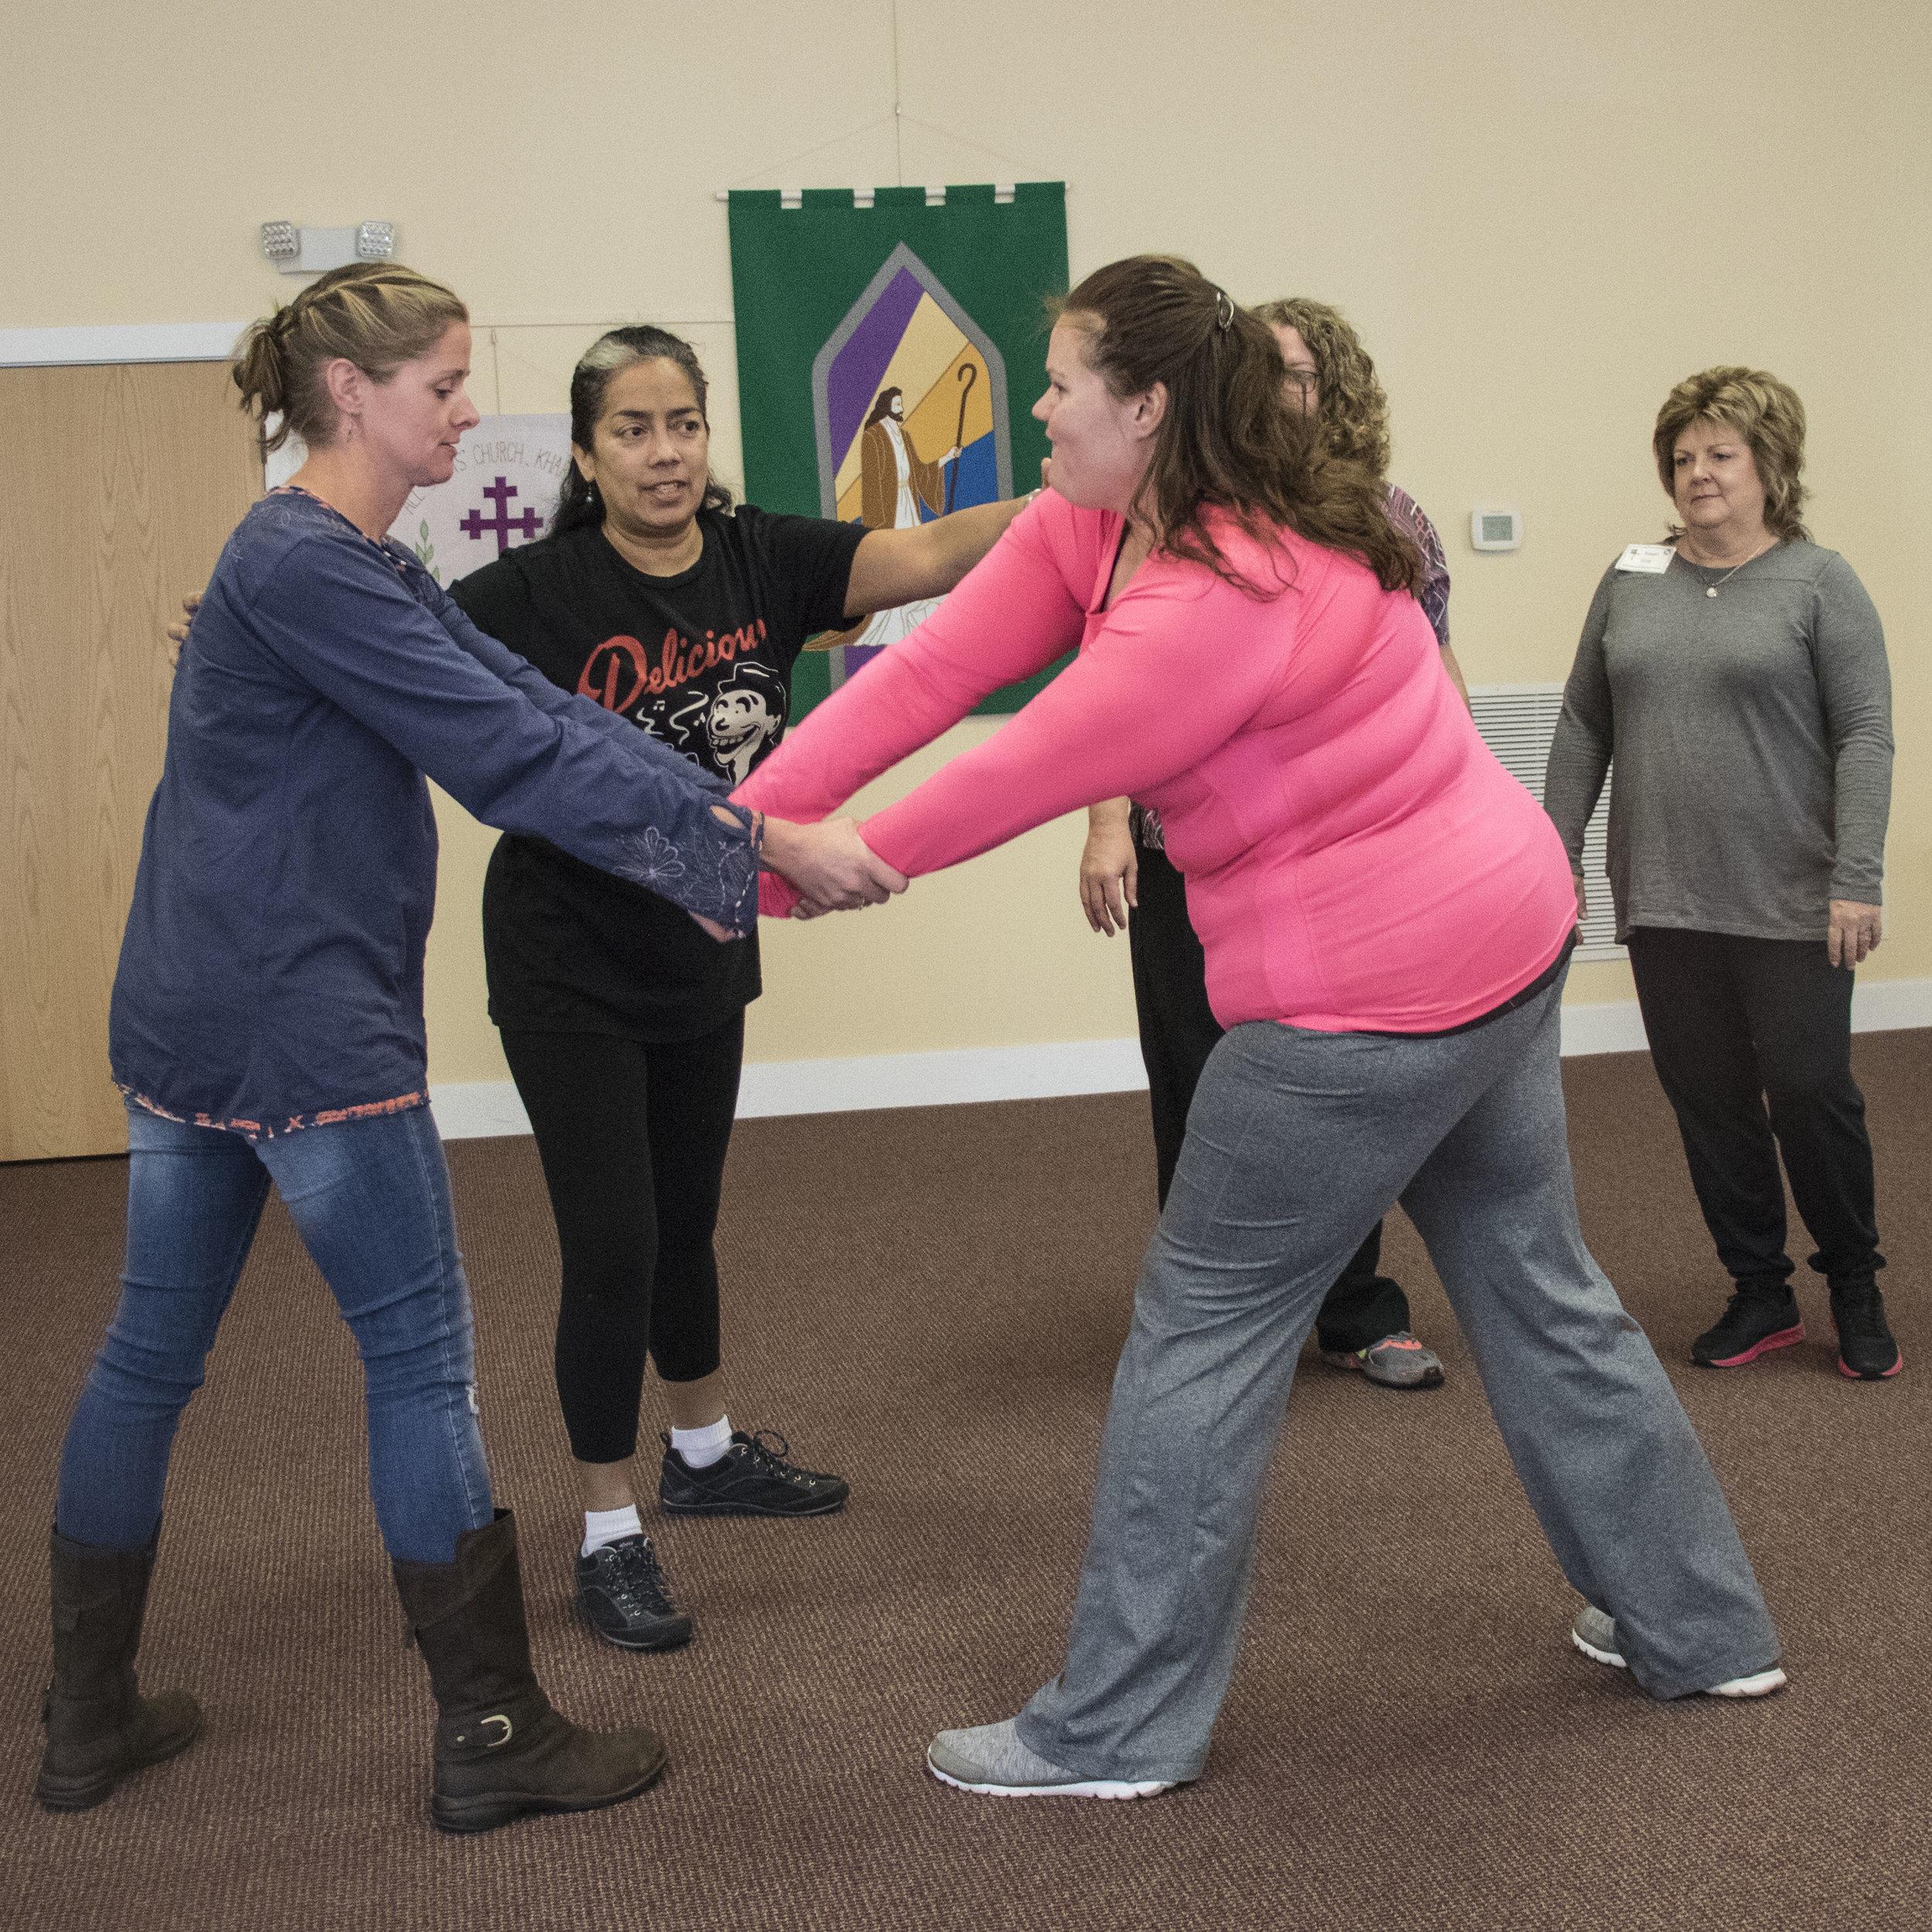 Cameron Green, Judith Alvarado, Amanda Guitierrez, Tracey Cothren, Susan Gray in a self defense class.